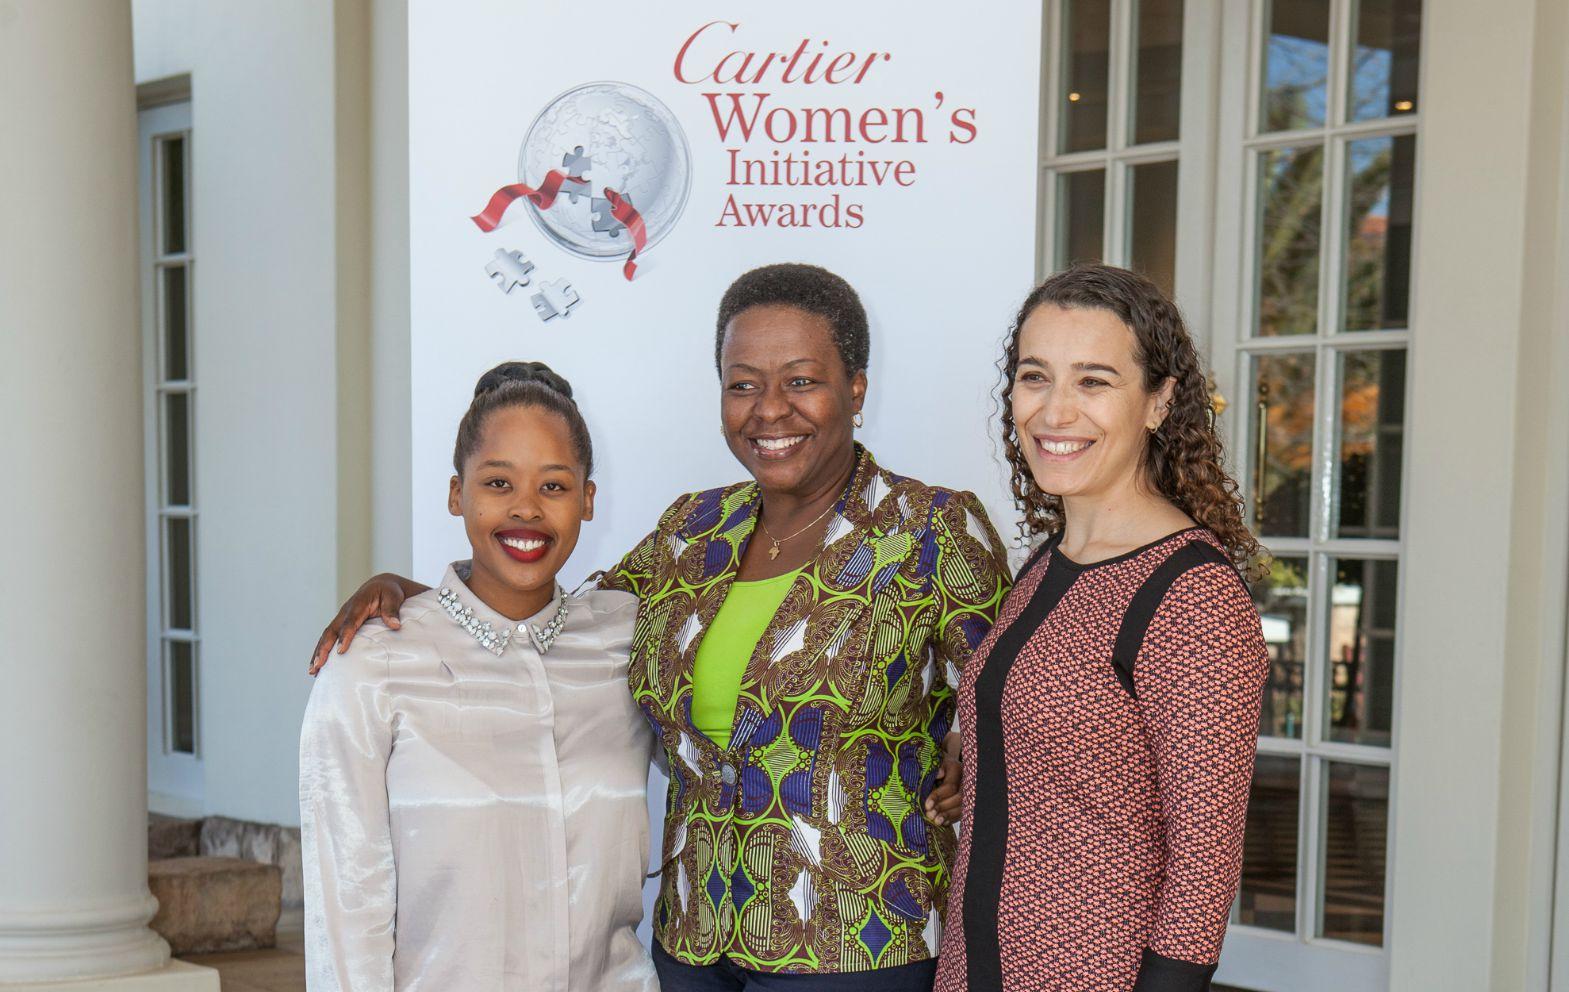 L-R:Thato Kgatlhanye,Chinwe Ohajuruka and Suzana Moreira